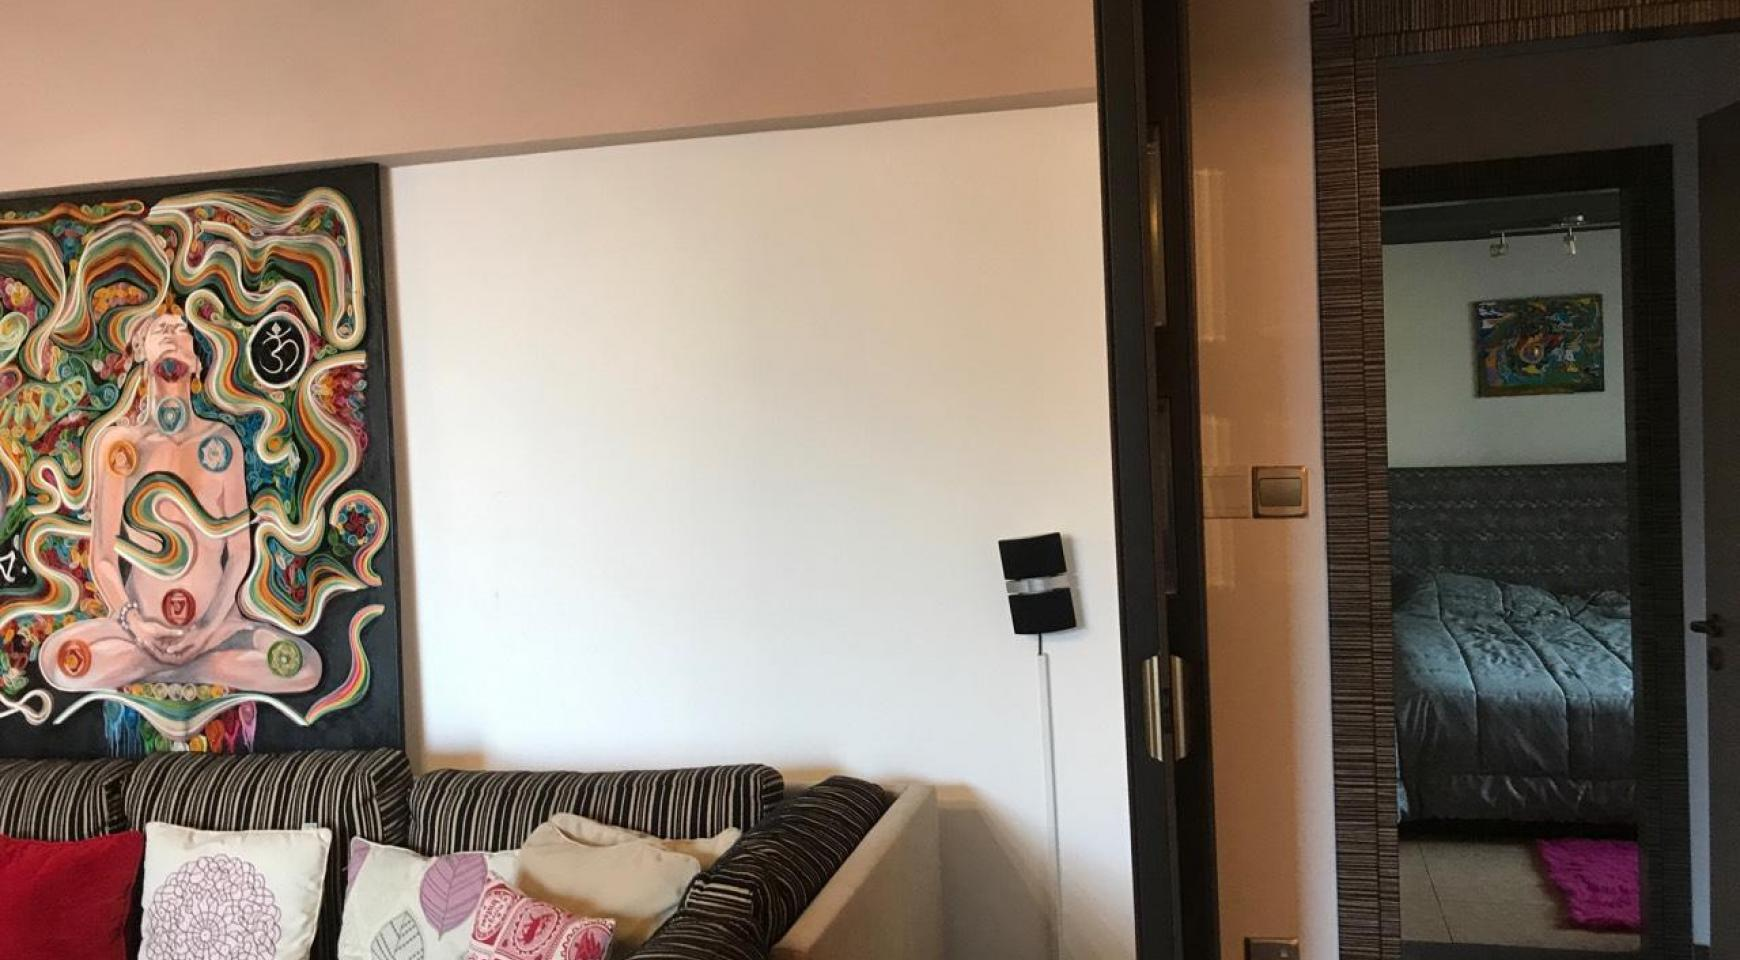 3 Bedroom Apartment in Molos Area near Limassol Marina - 2